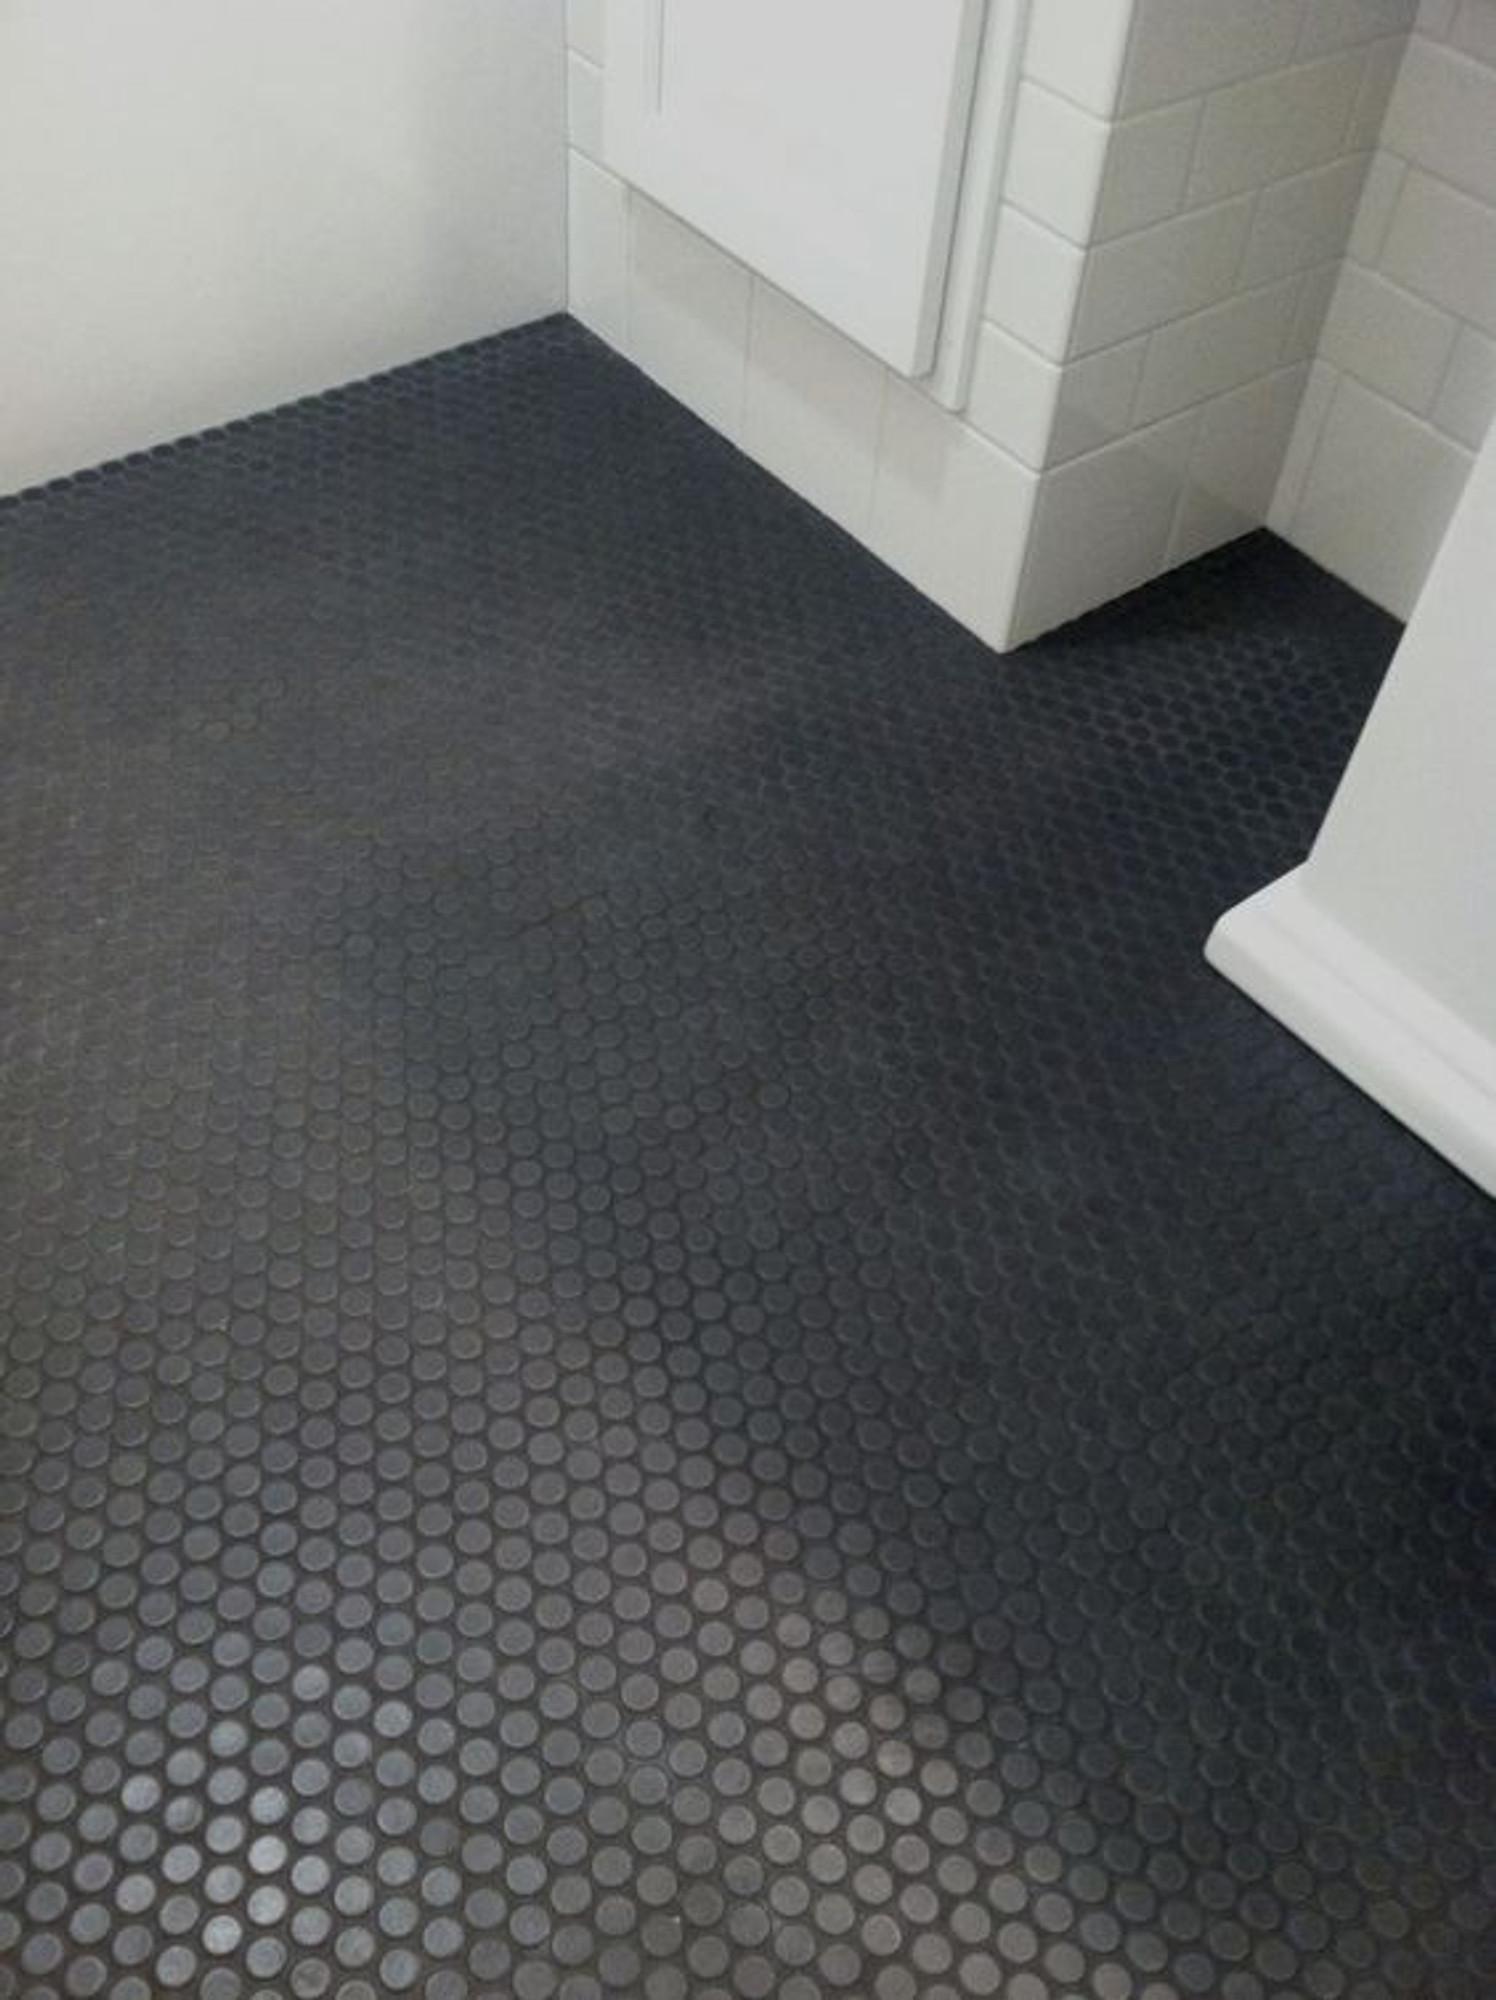 Matt Black Penny Round Mosaic Wall Tiles Buy Online Tiles4less